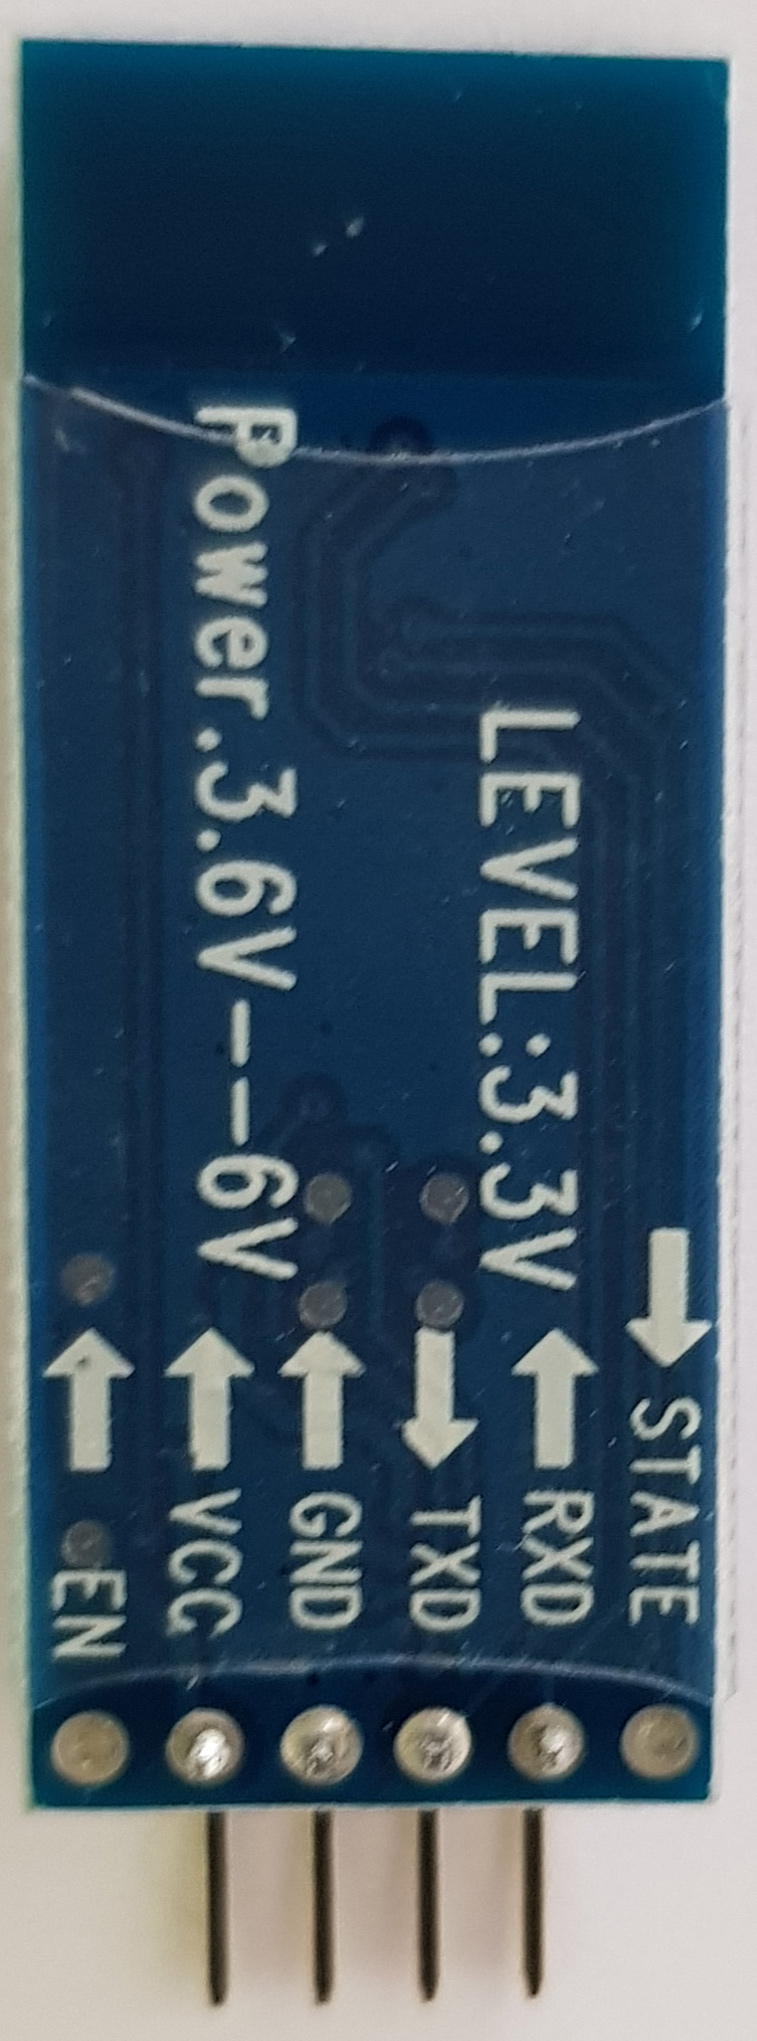 HC06 Bluetooth module pins